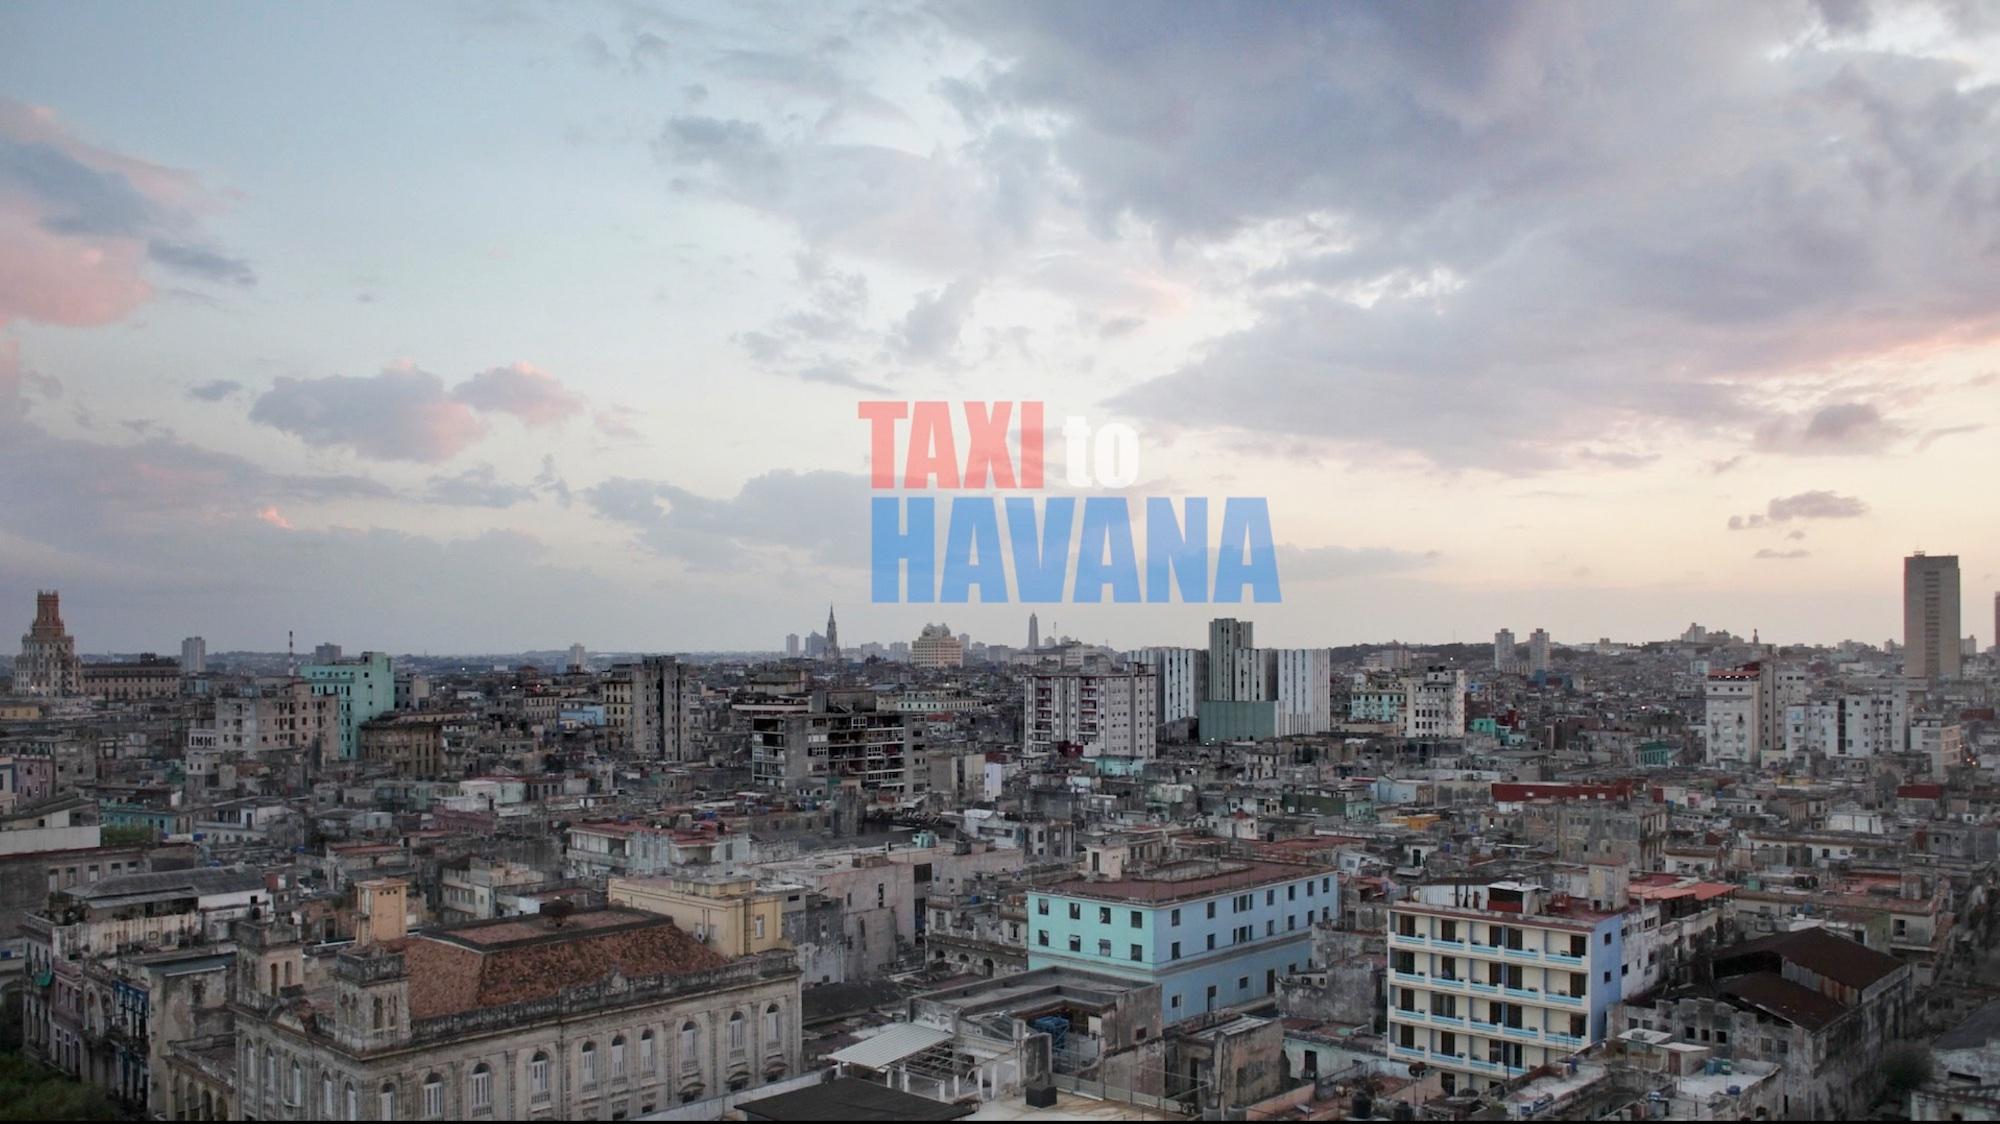 TAXI TO HAVANA